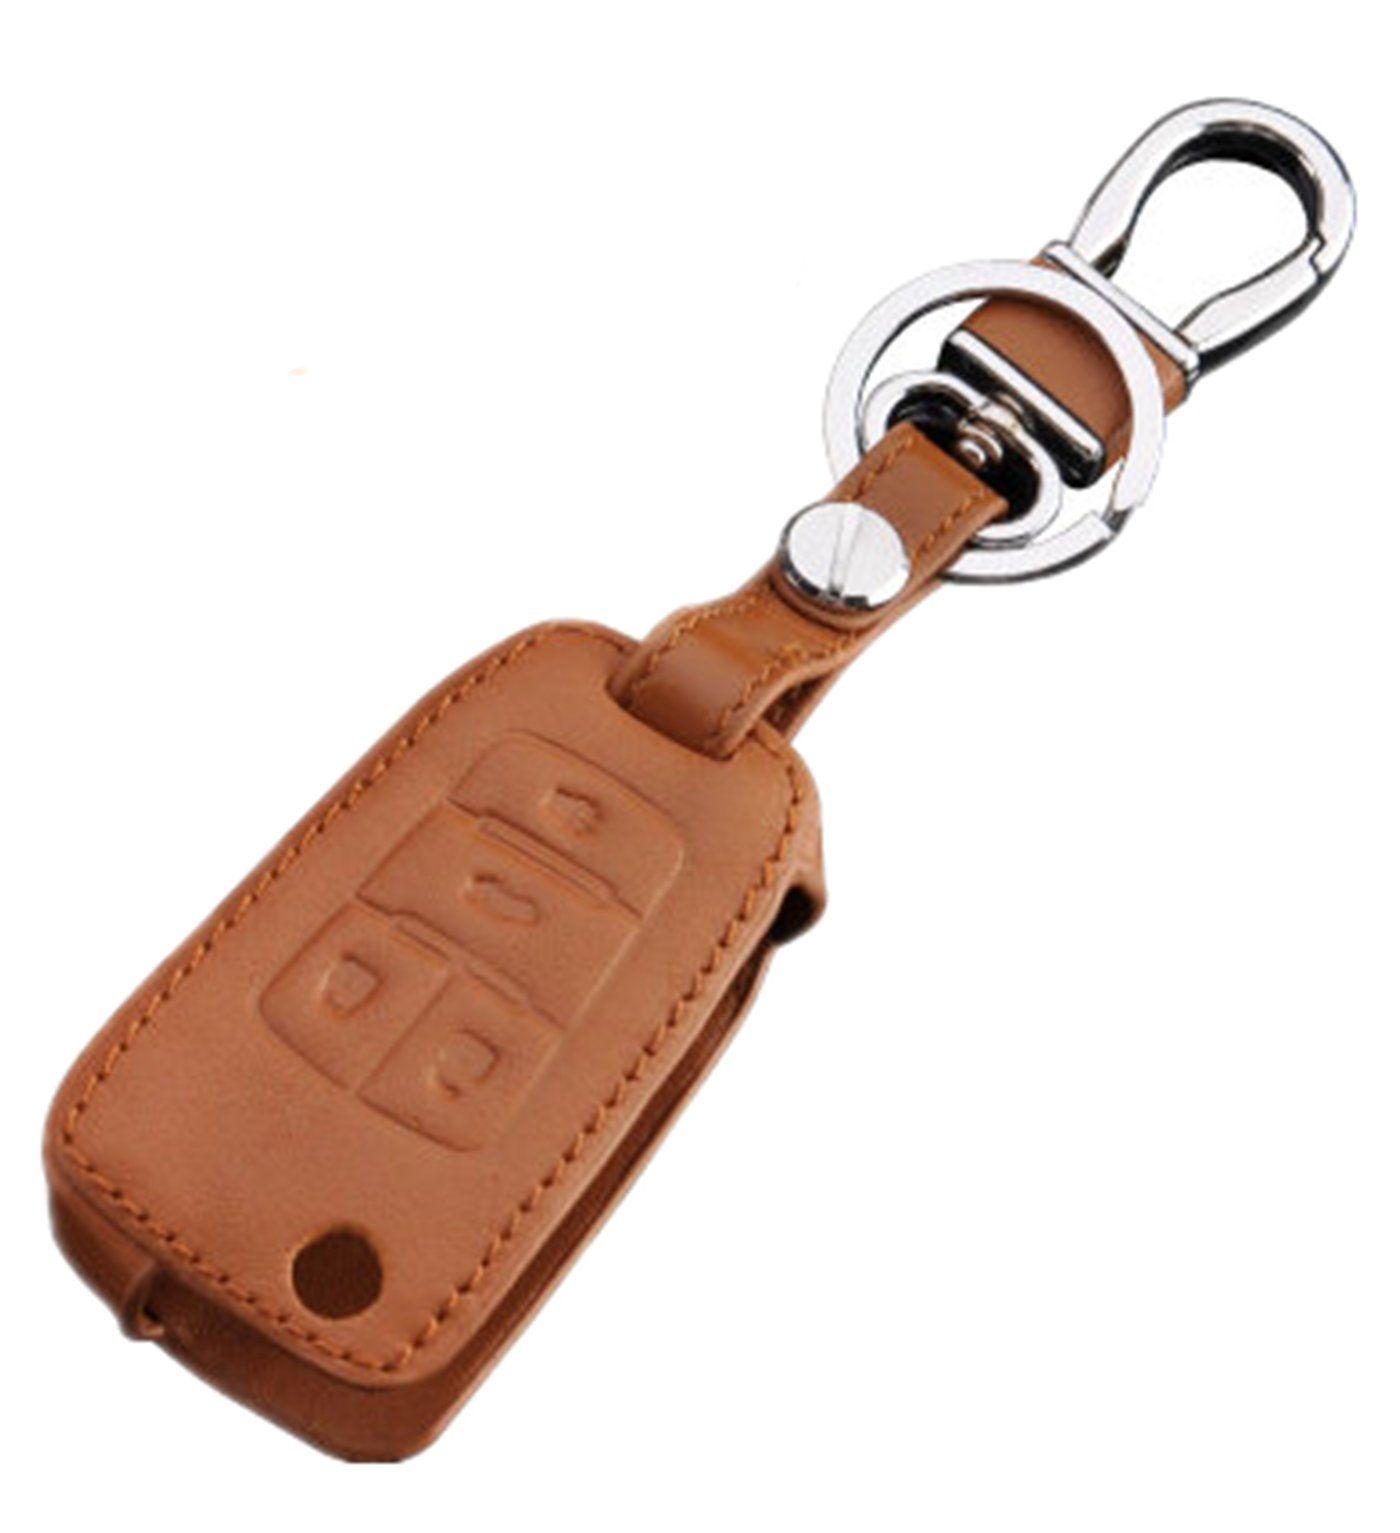 Kawihen leather smart remote key fob case holder cover for